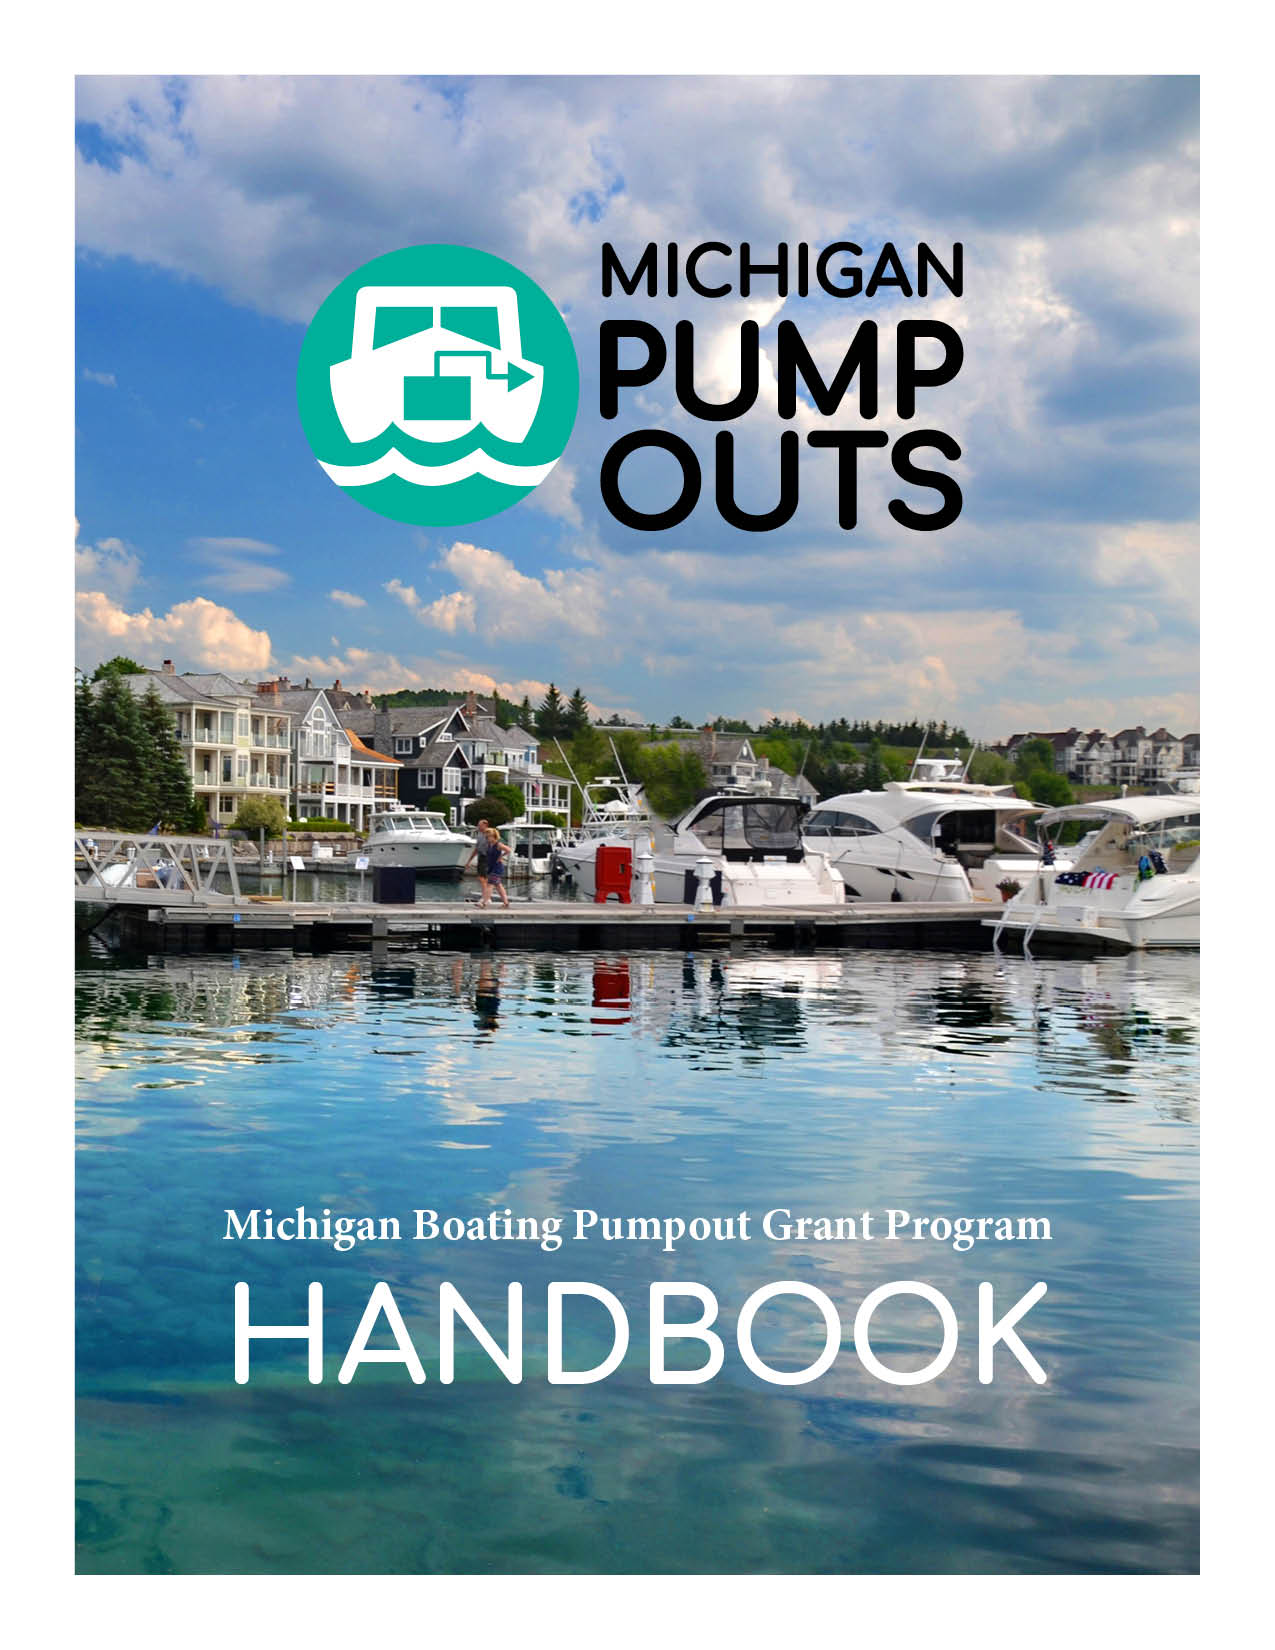 Michigan Pumpouts Handbook cover